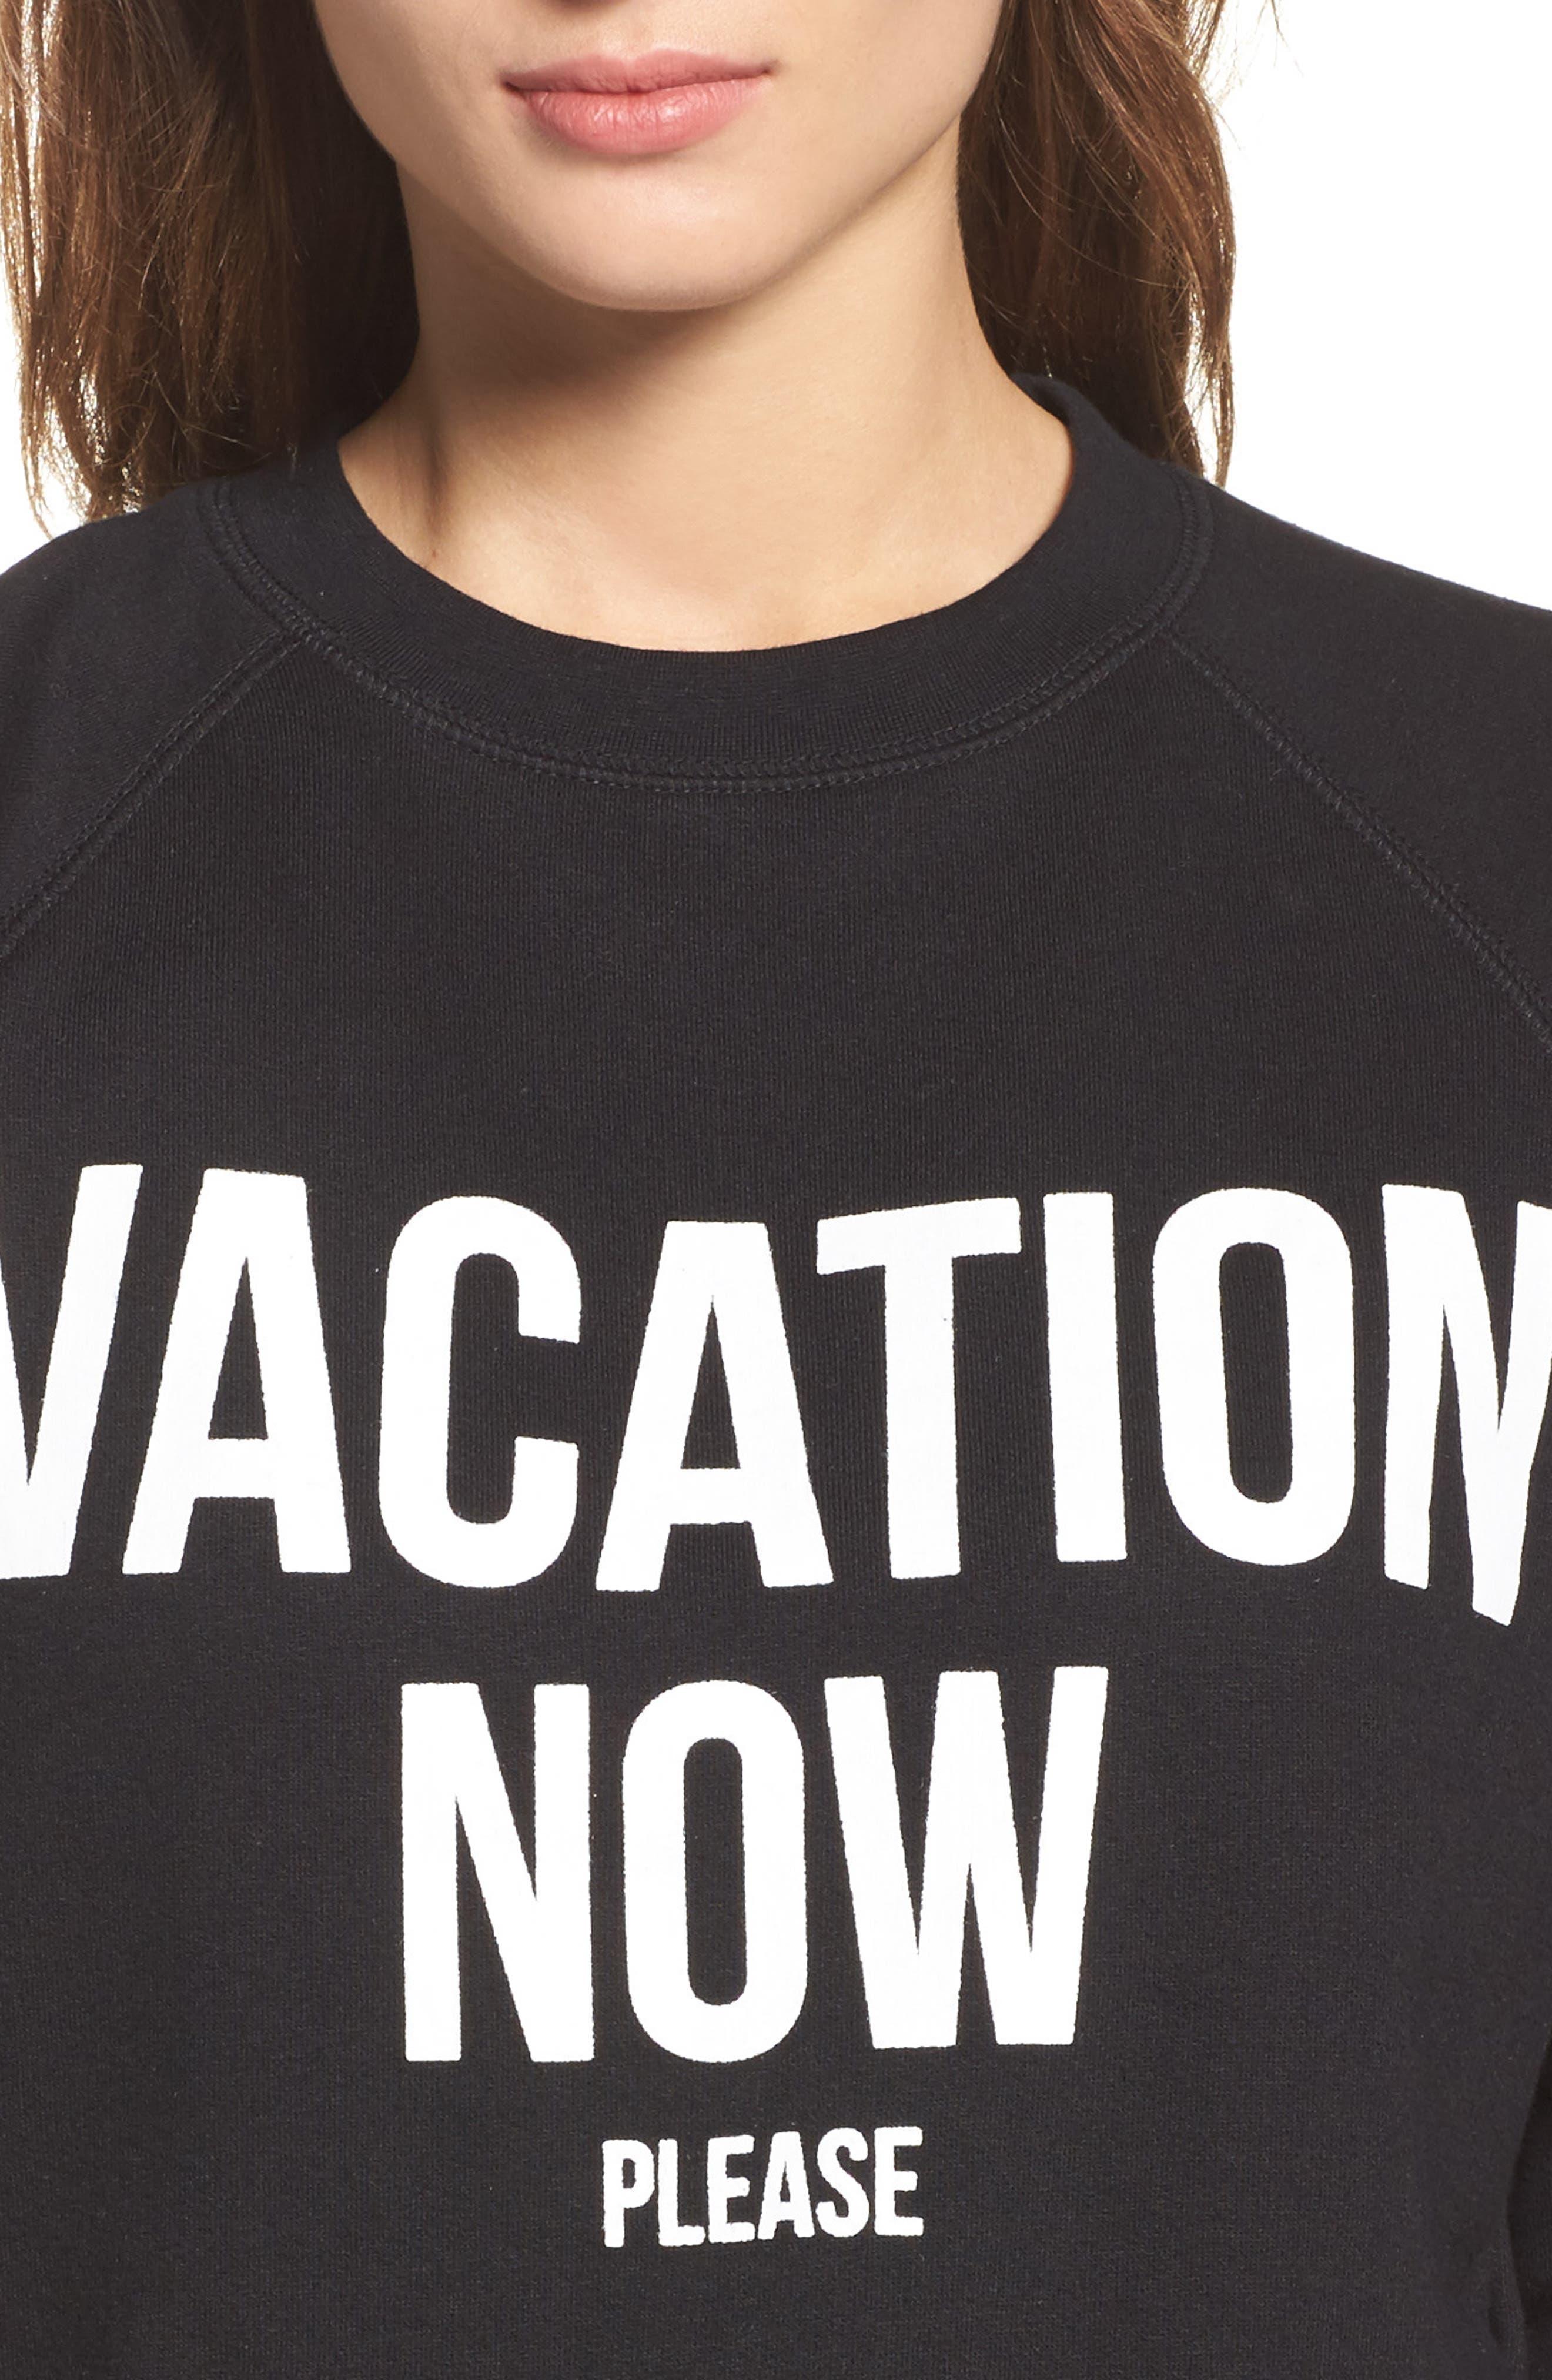 Vacation Now Sweatshirt,                             Alternate thumbnail 4, color,                             Black